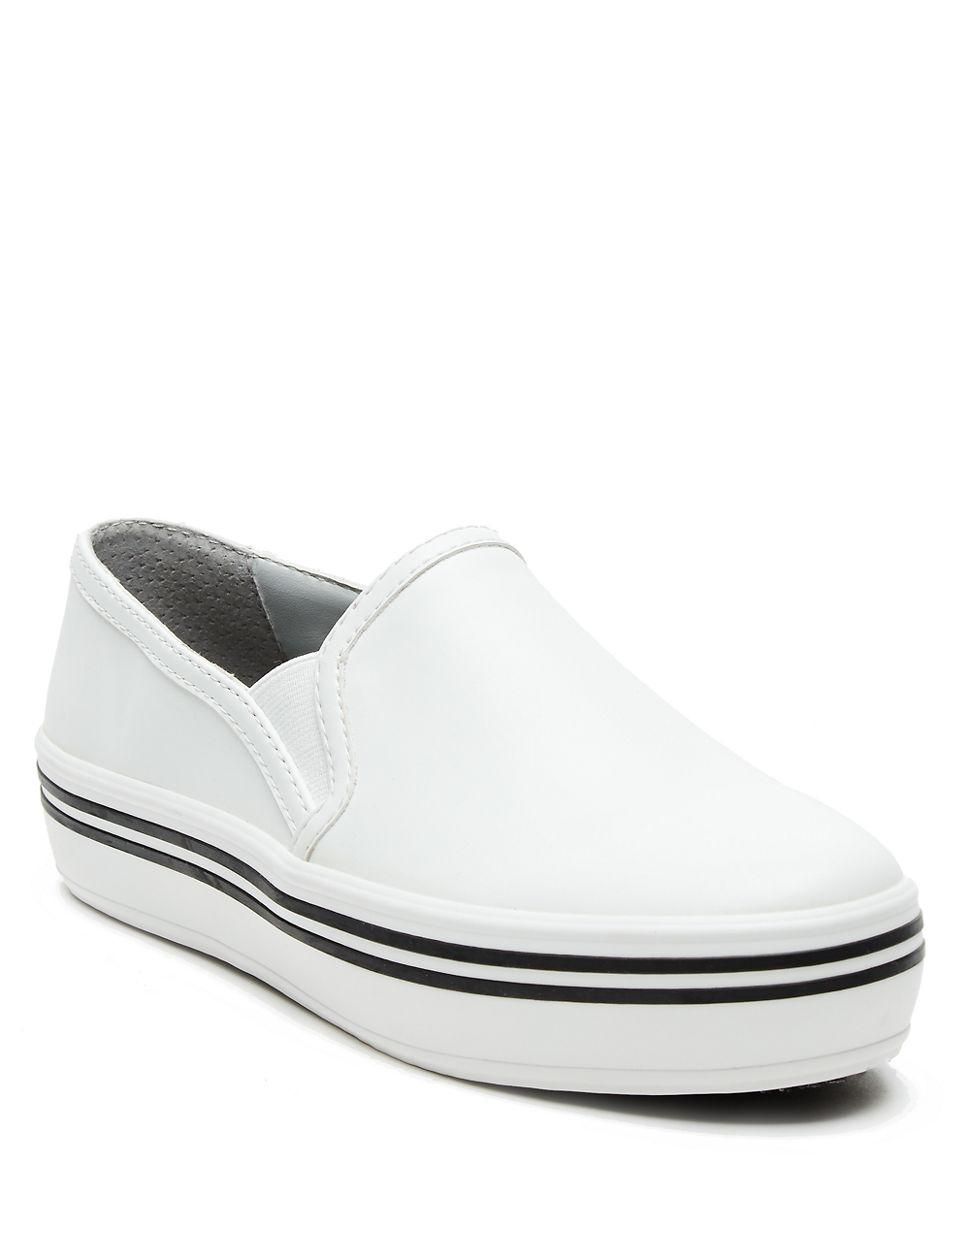 dolce vita jinsy platform slip on sneakers in white lyst